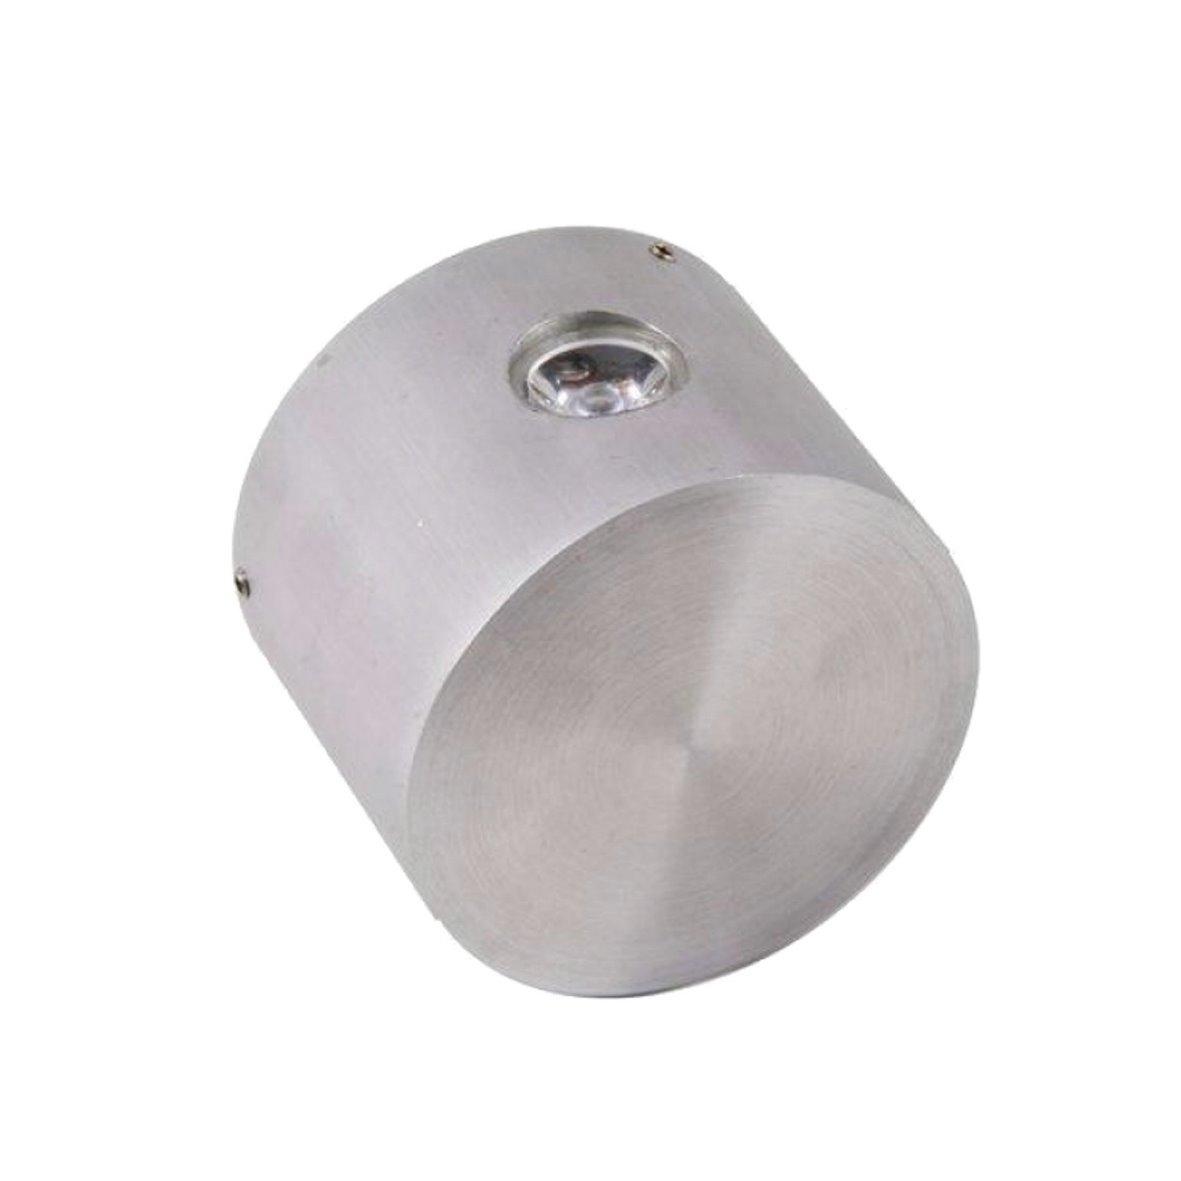 wandlampe wandleuchte wand lampe leuchte spot strahler innen wandstrahler aussen ebay. Black Bedroom Furniture Sets. Home Design Ideas